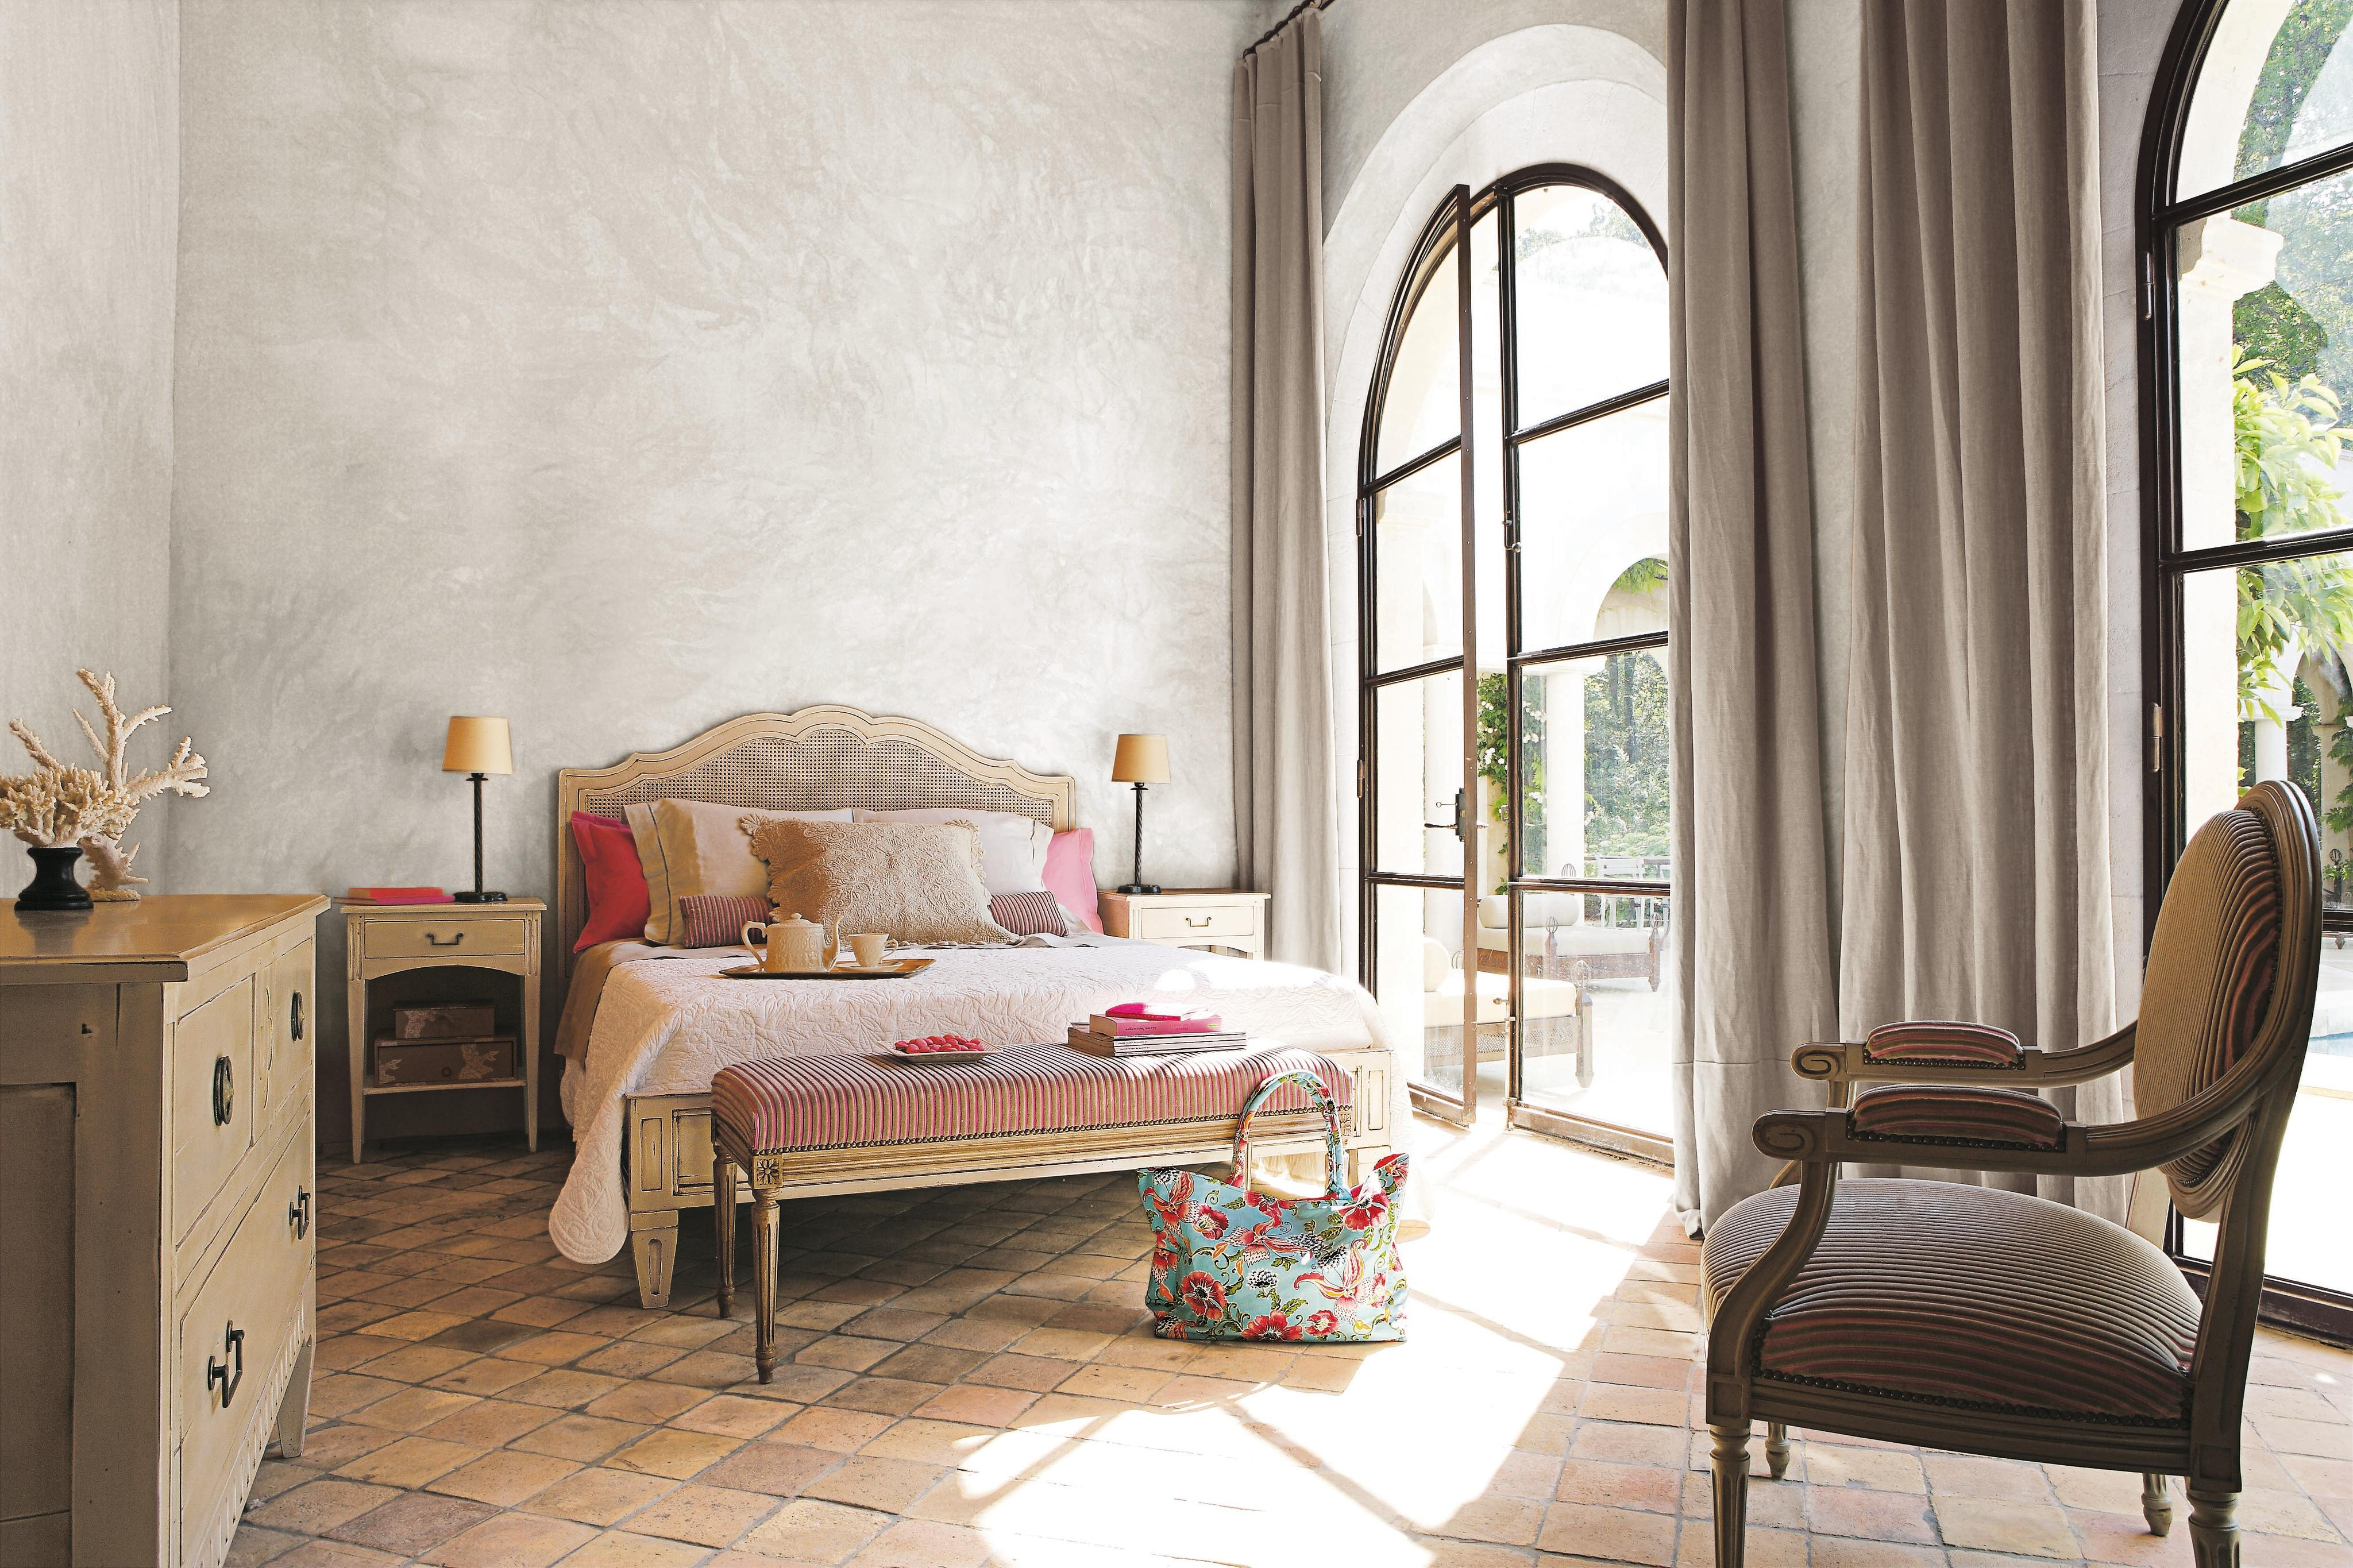 rundbogen bilder ideen couchstyle. Black Bedroom Furniture Sets. Home Design Ideas